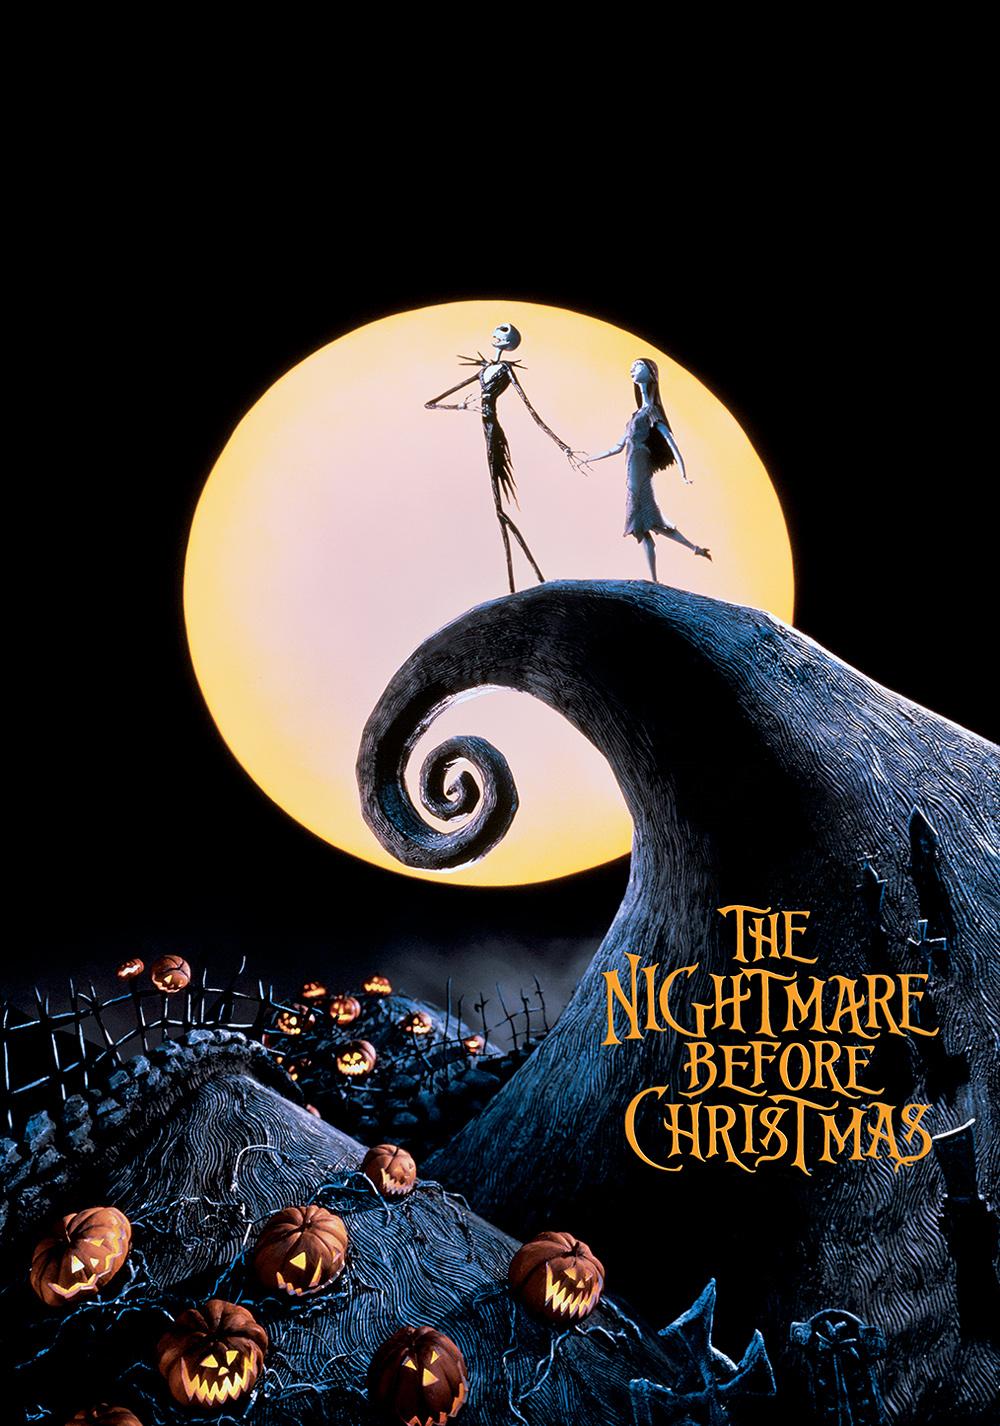 The Nightmare Before Christmas | Figure Skating Wikia | FANDOM ...